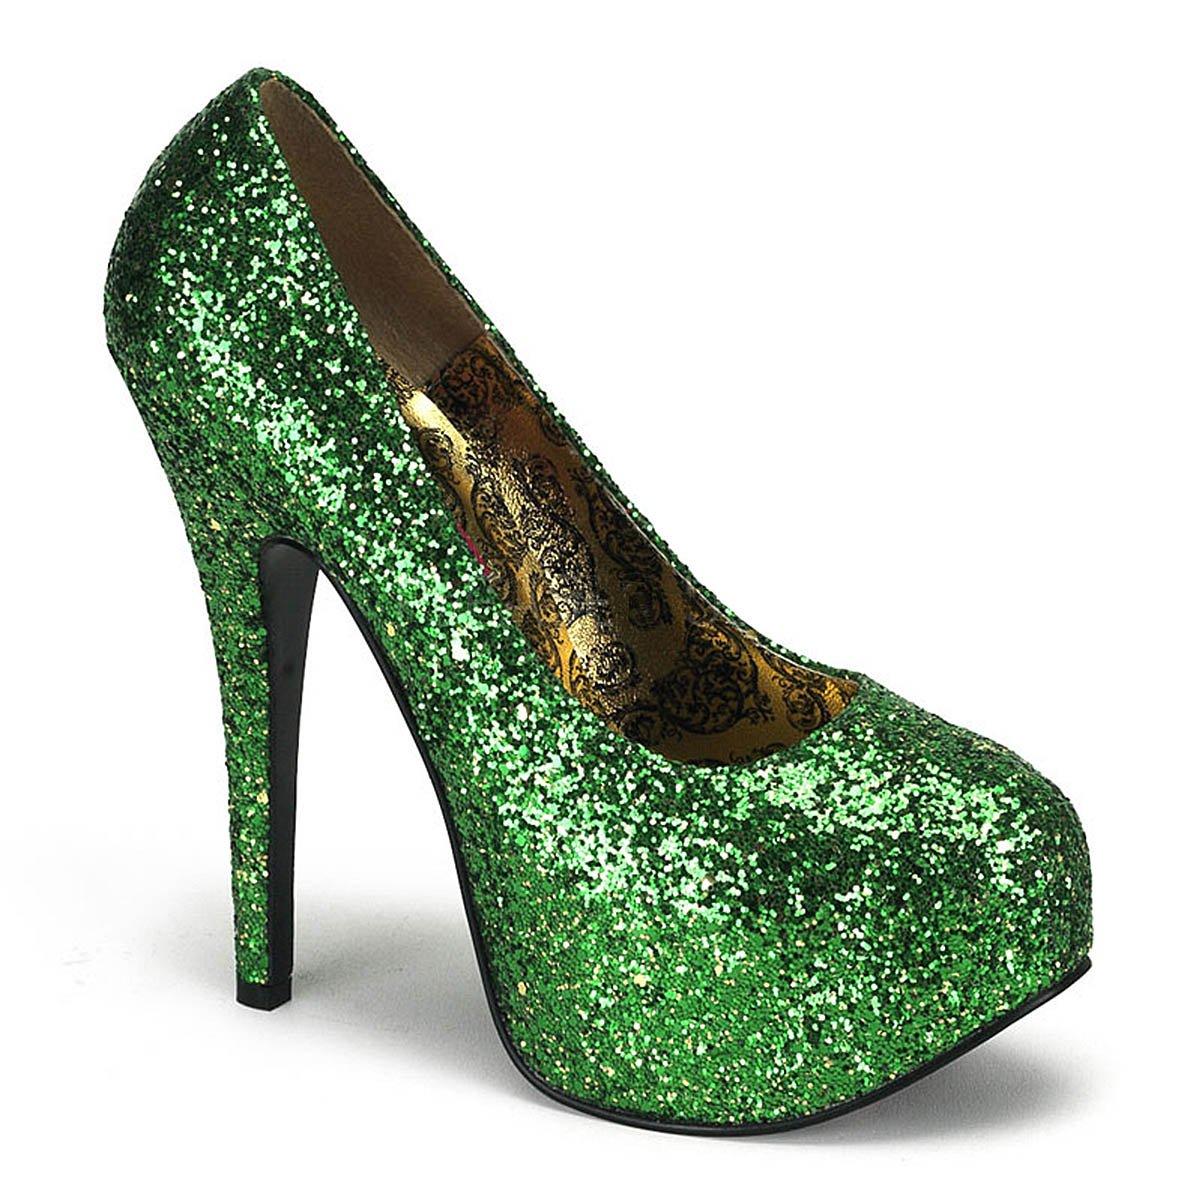 Amazon.com  Womens St Pattys Day Pumps Green Glitter Shoes 5 3 4 Inch Heel  St Patricks  Clothing 36693115f